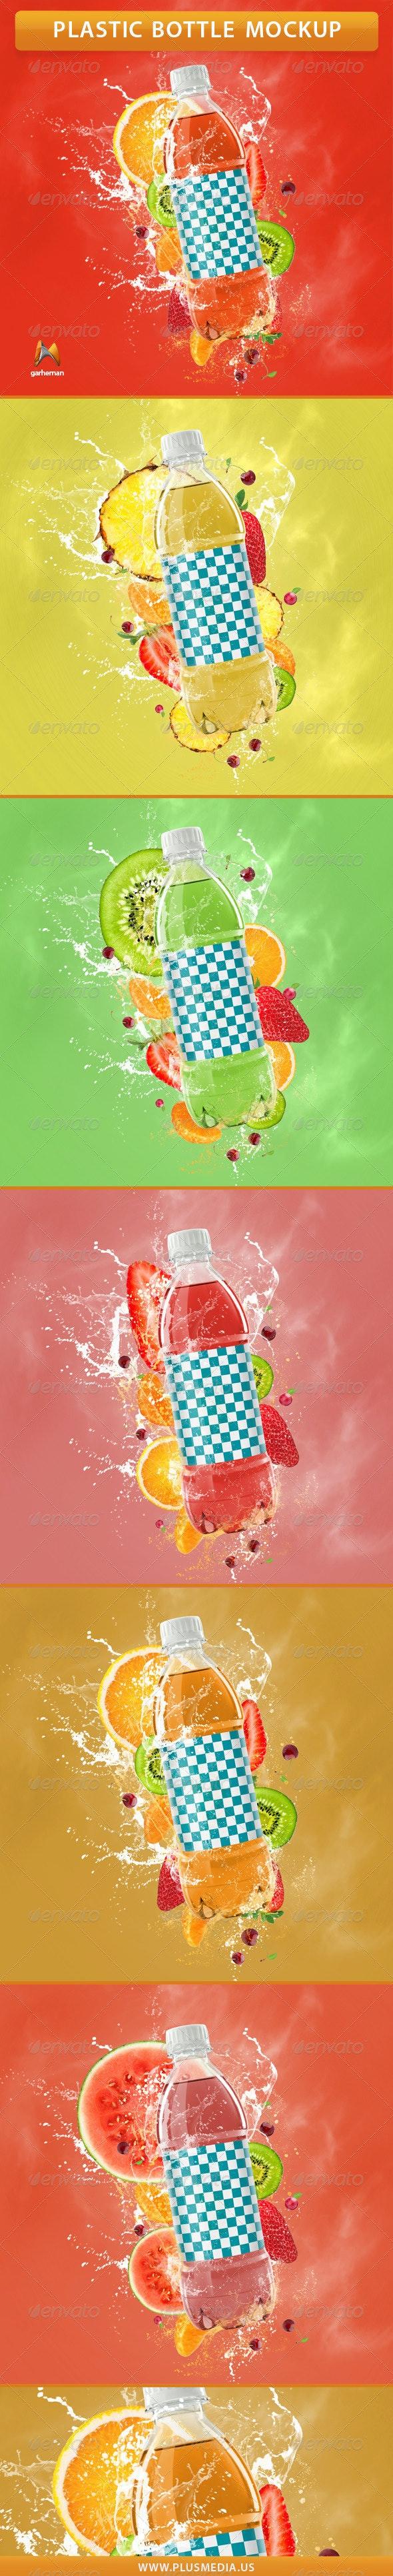 Plastic Bottle Mockup - Product Mock-Ups Graphics